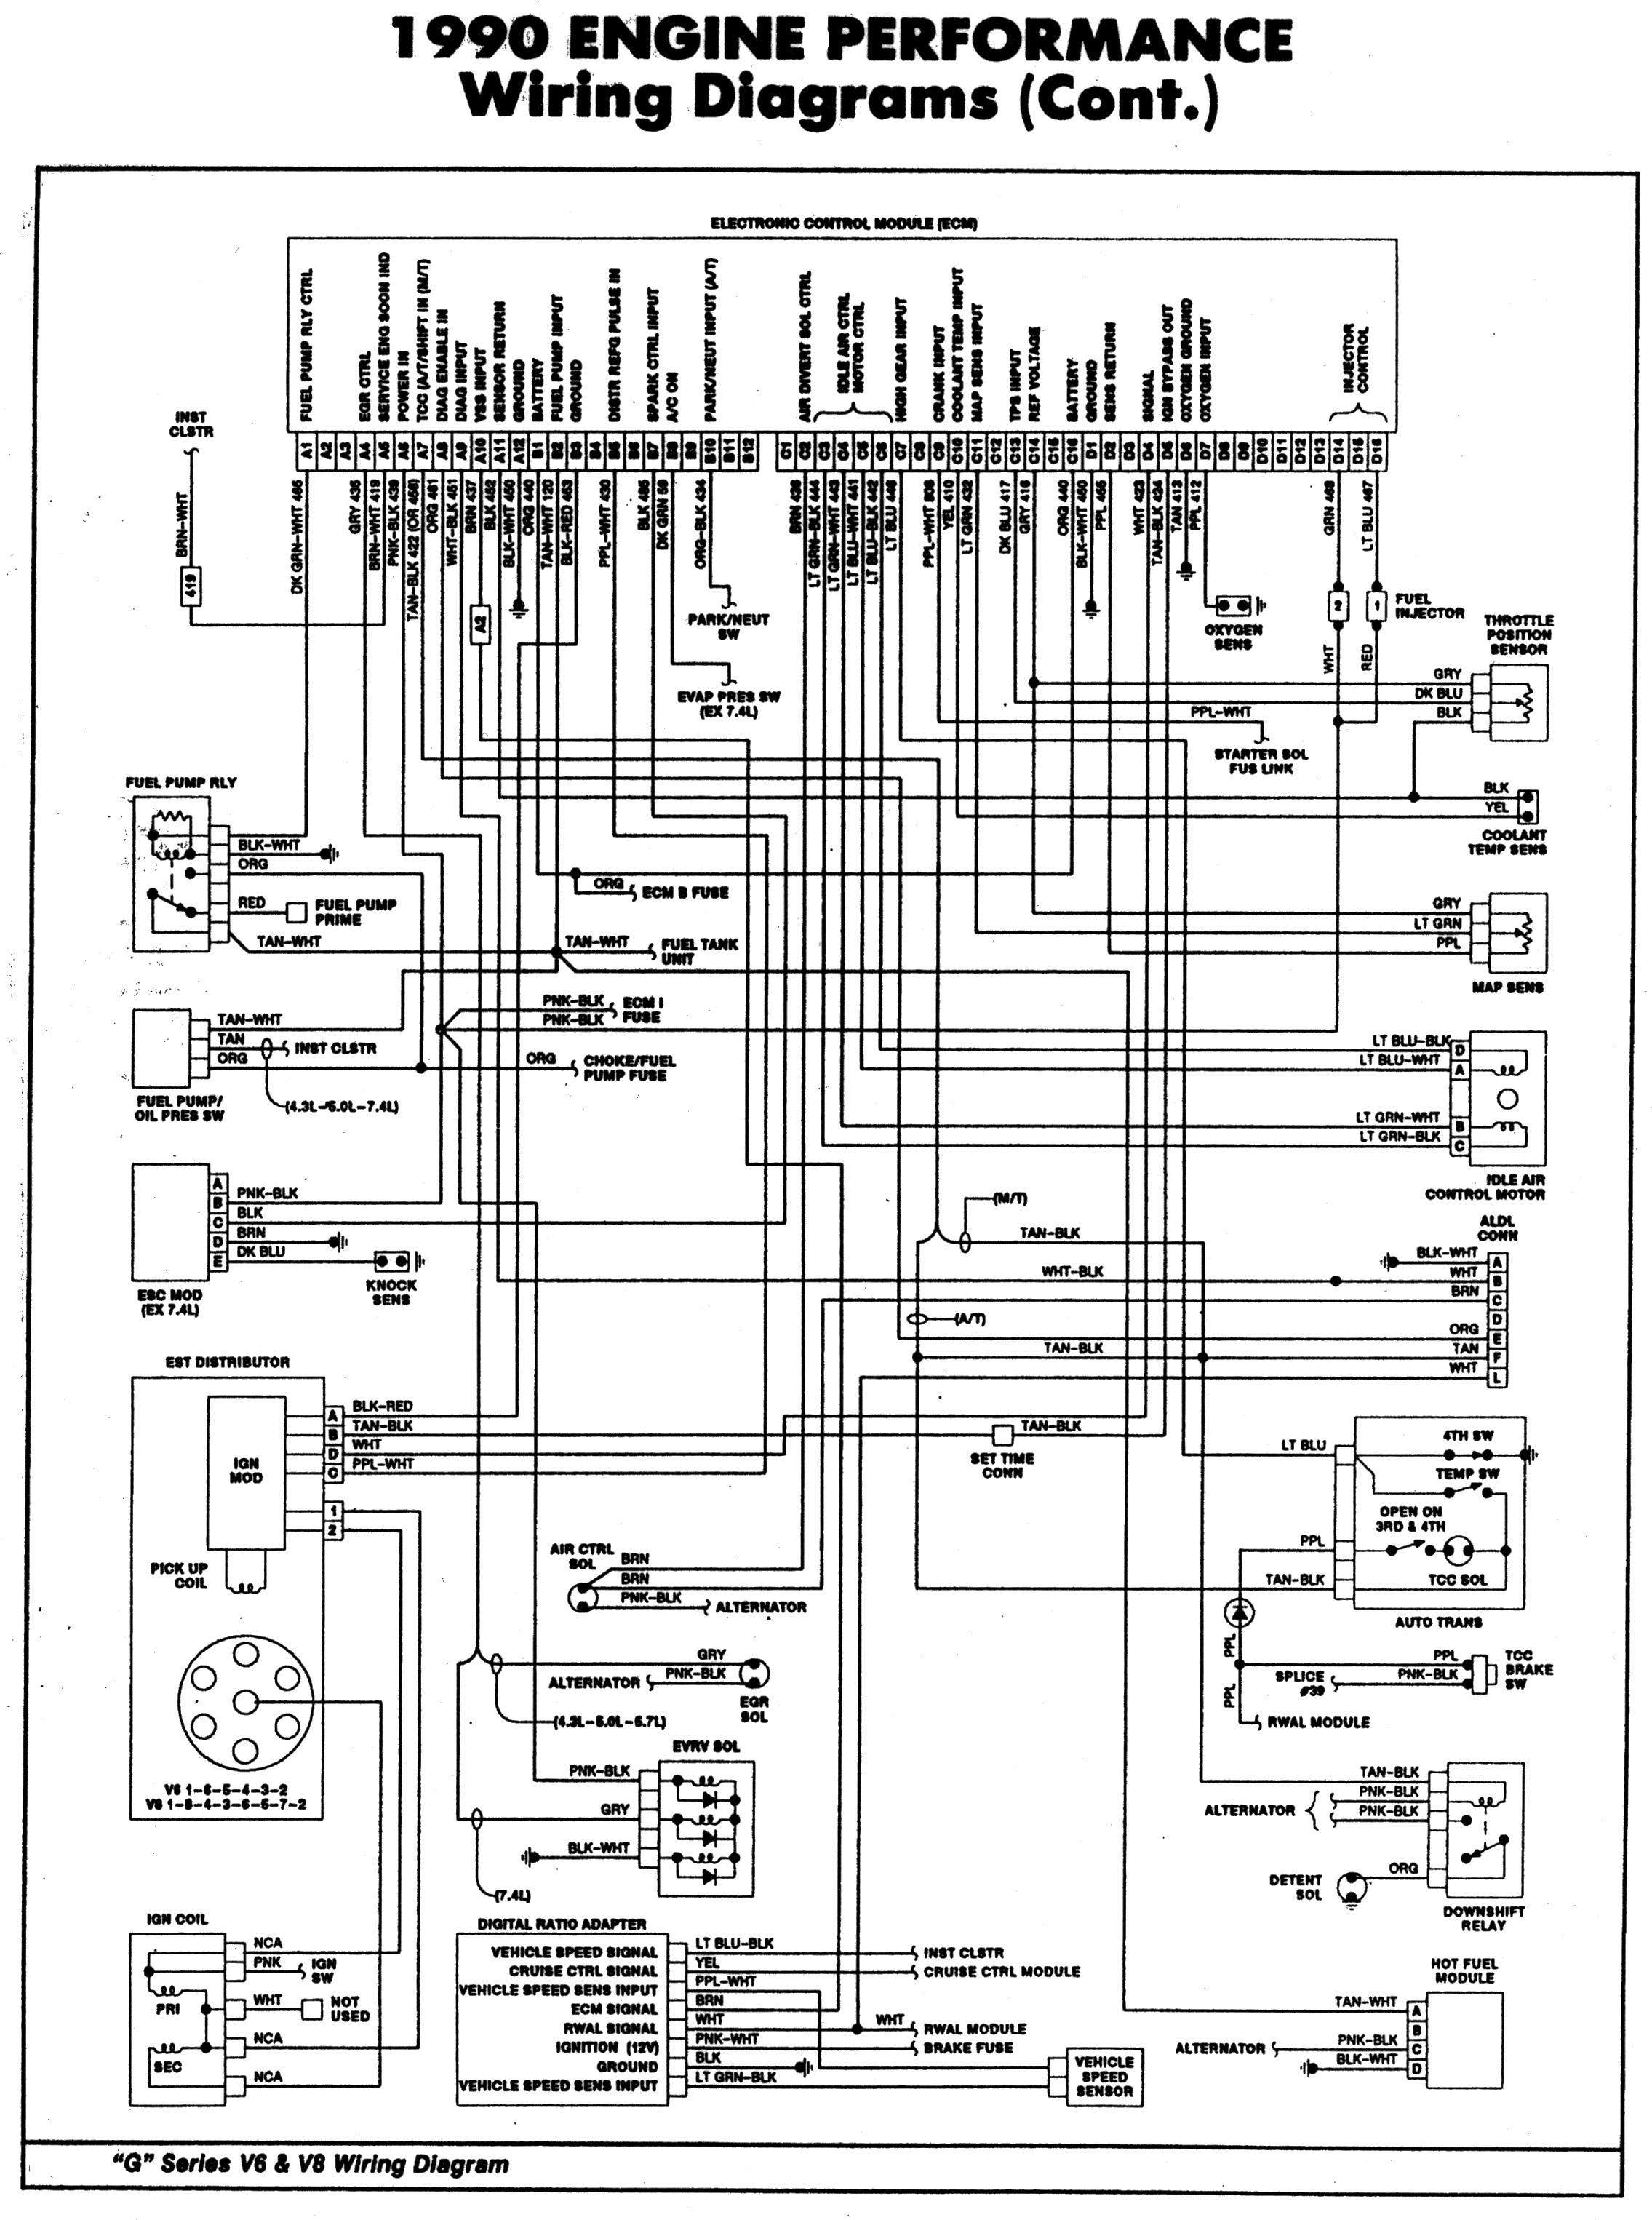 2005 Dodge Ram 1500 Fuel Pump Wiring Diagram